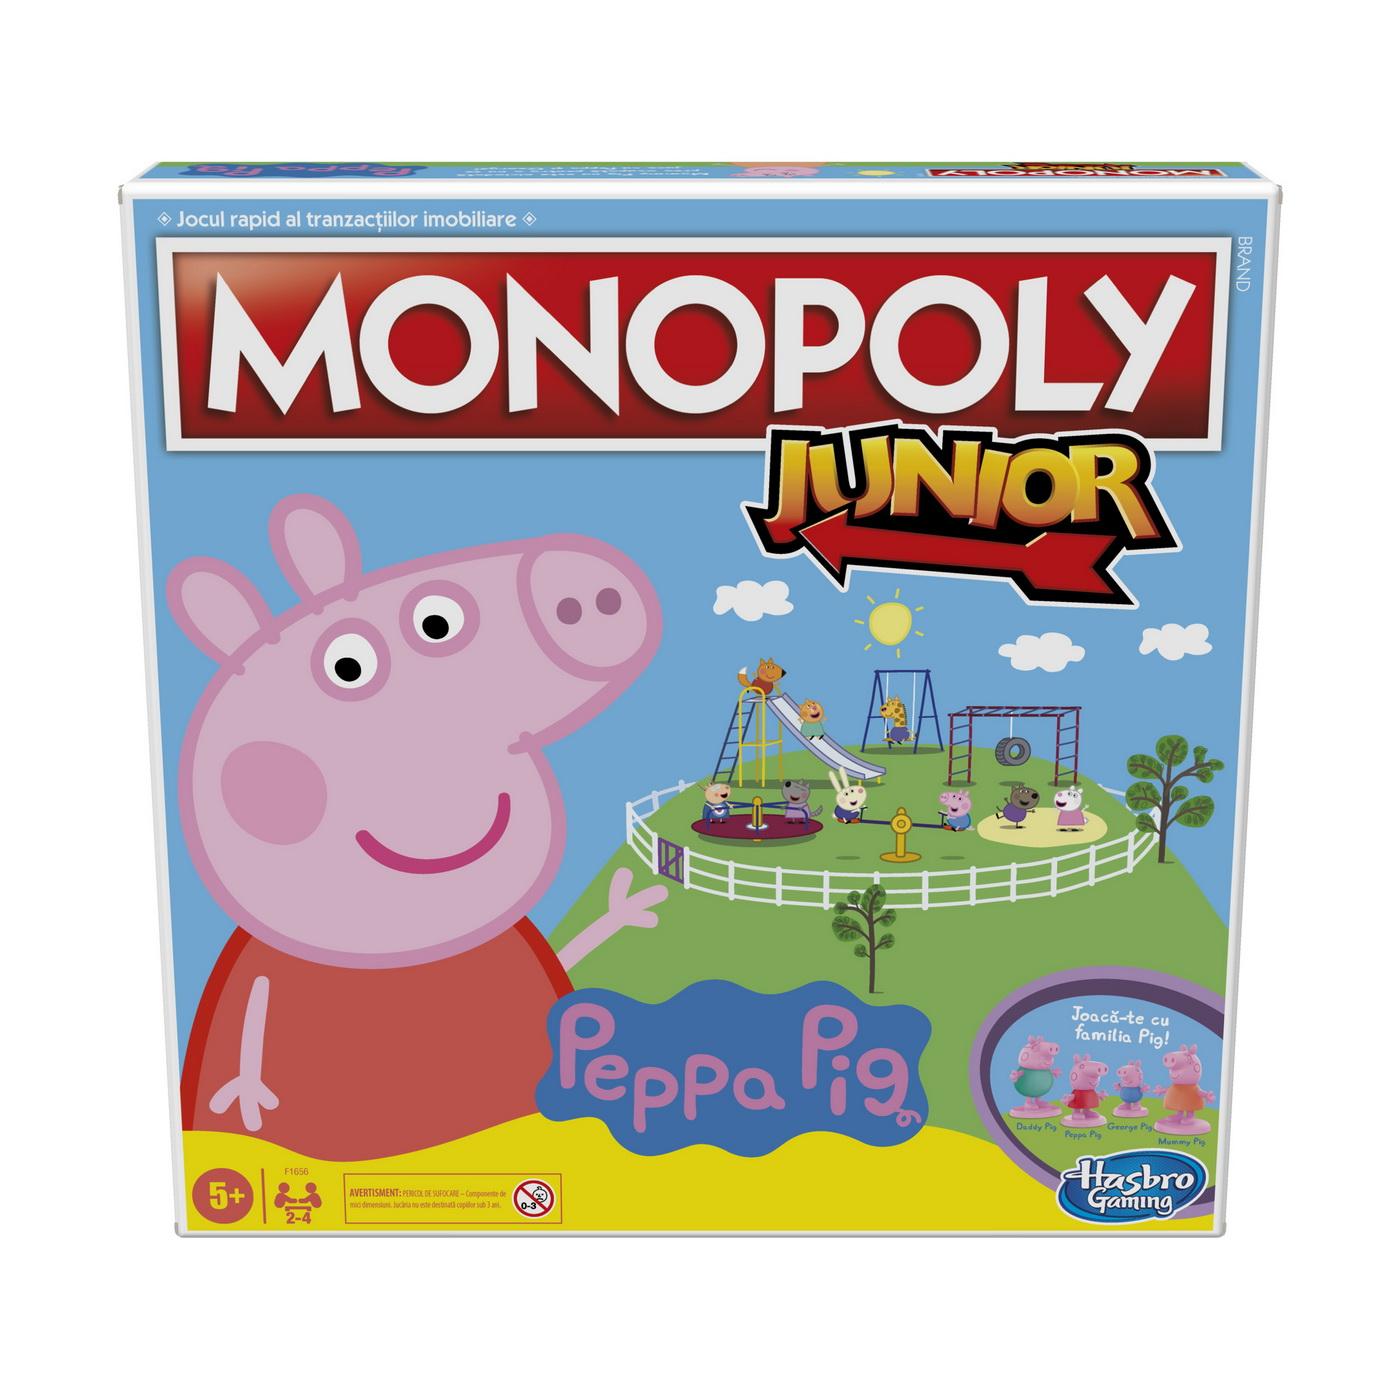 Monopoly Junior - Peppa Pig | Hasbro